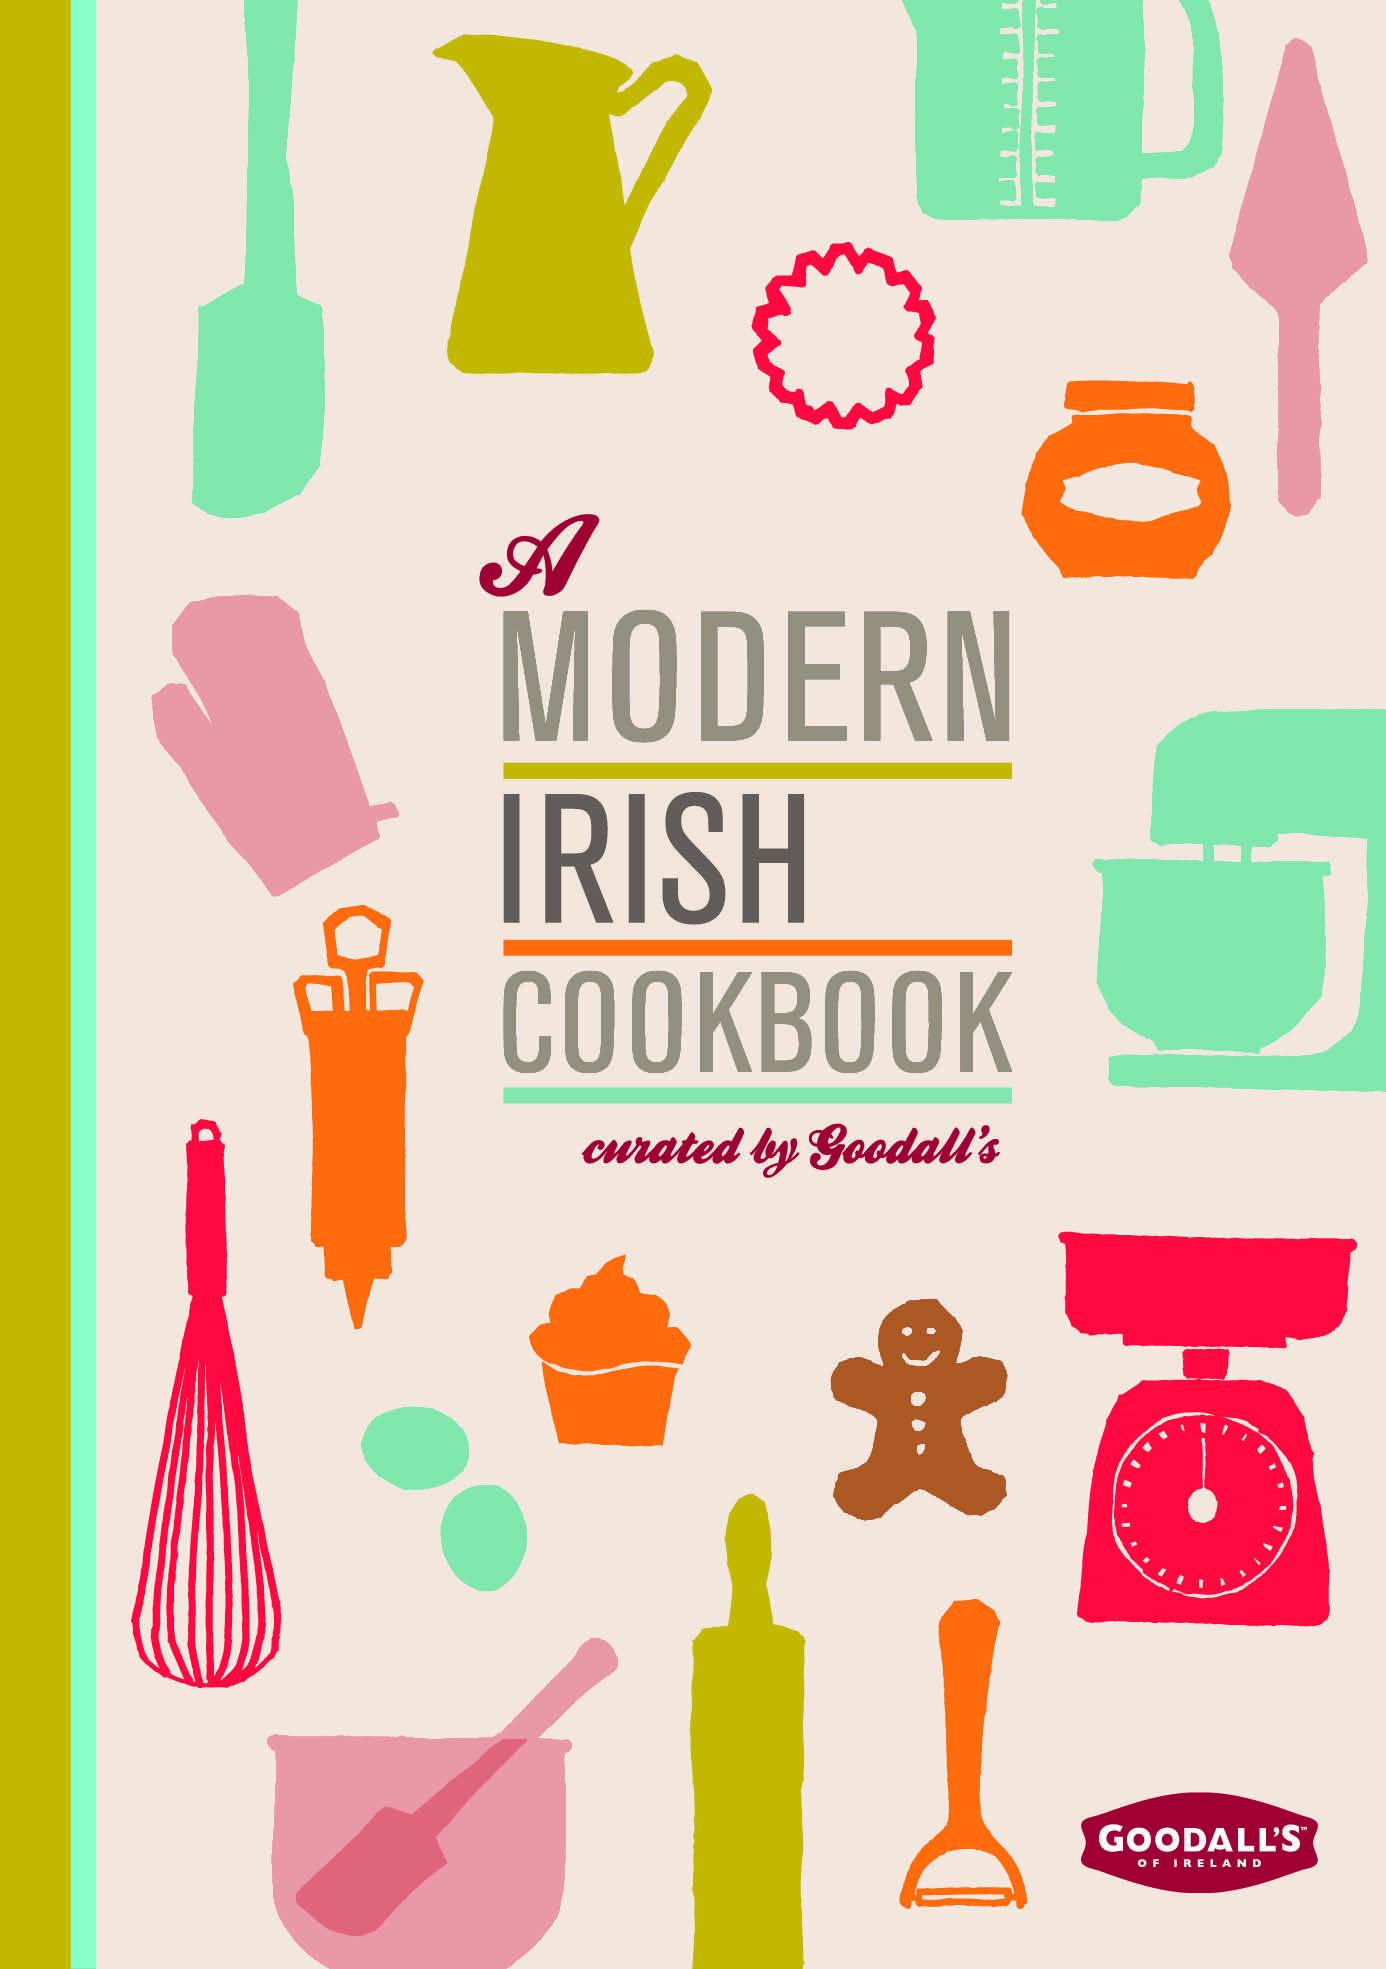 A Modern Irish Cookbook